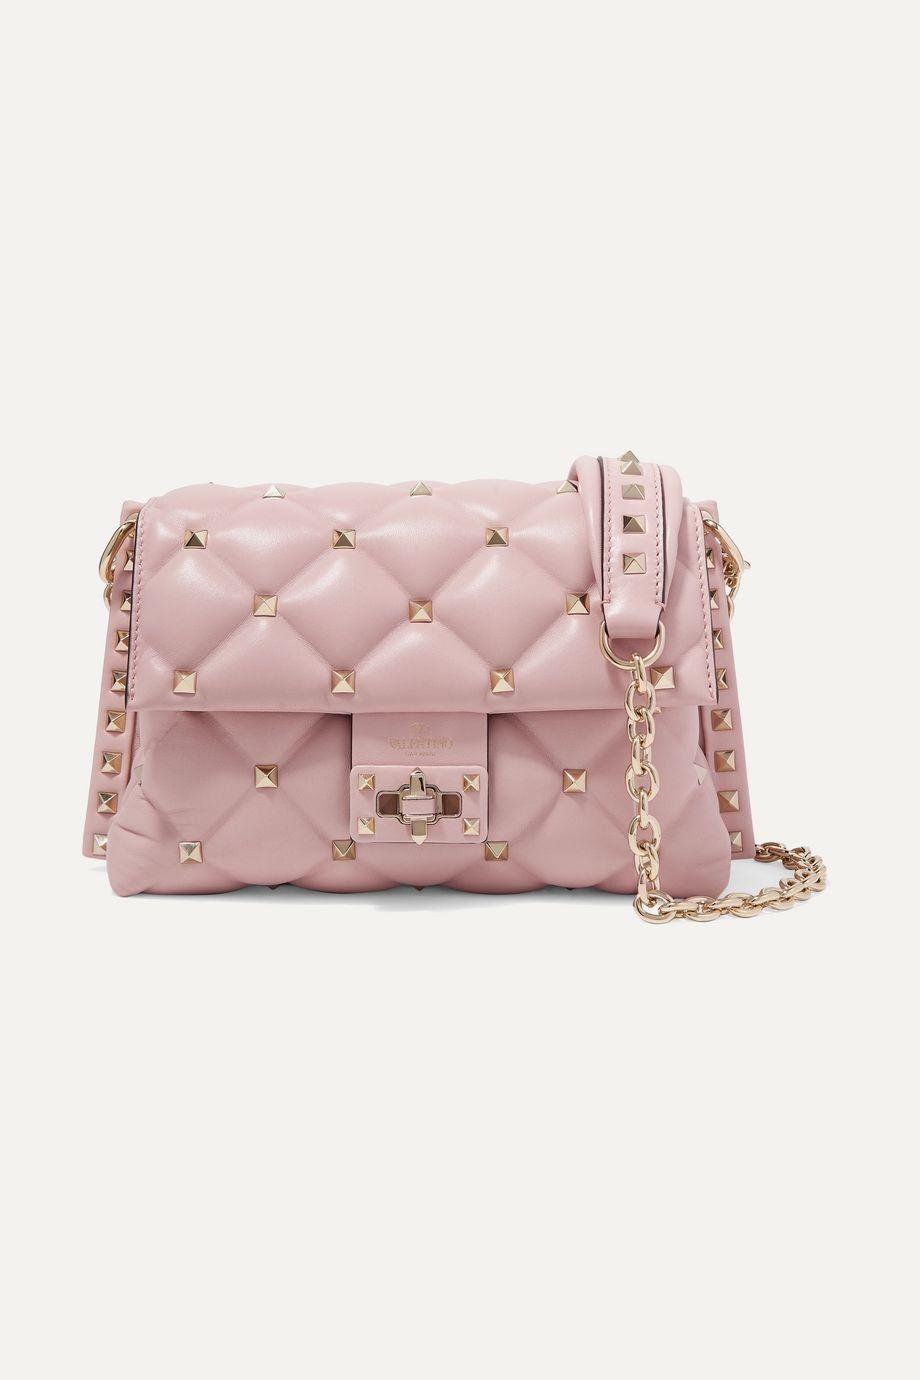 Valentino Valentino Garavani Candystud medium quilted leather shoulder bag